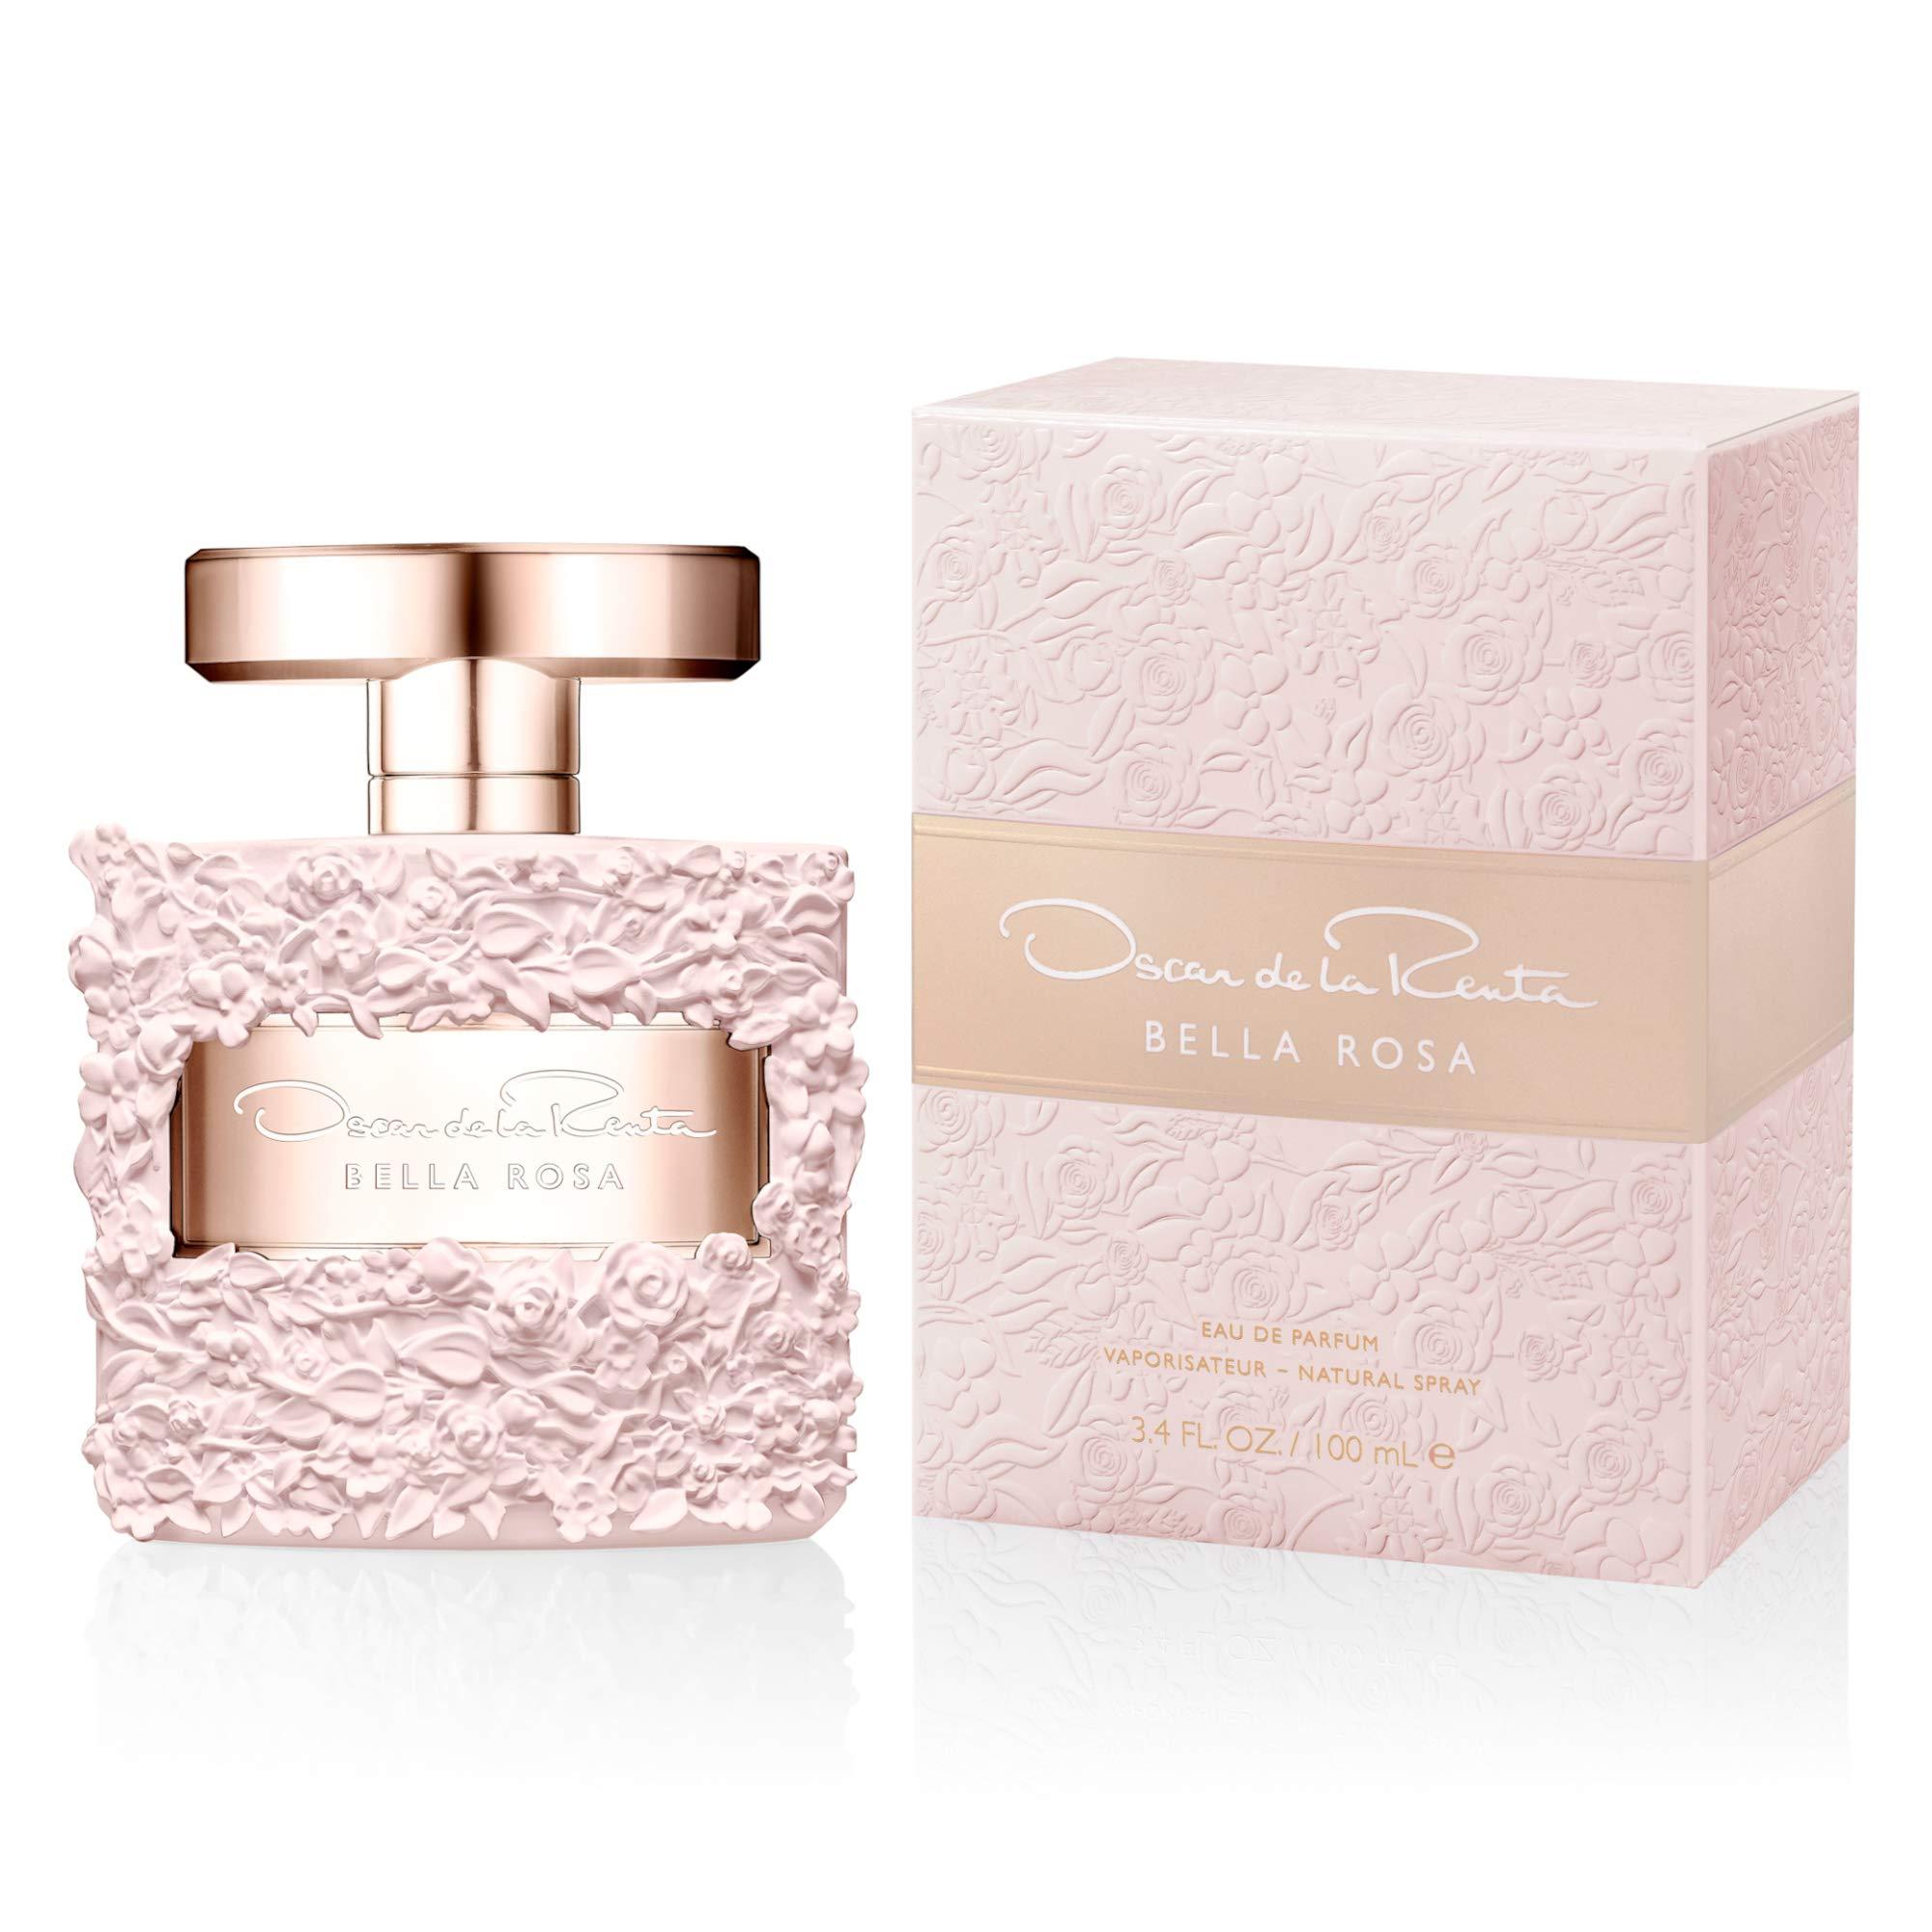 Oscar de la Renta Bella Rosa Women's Eau de Perfume, 100 ml